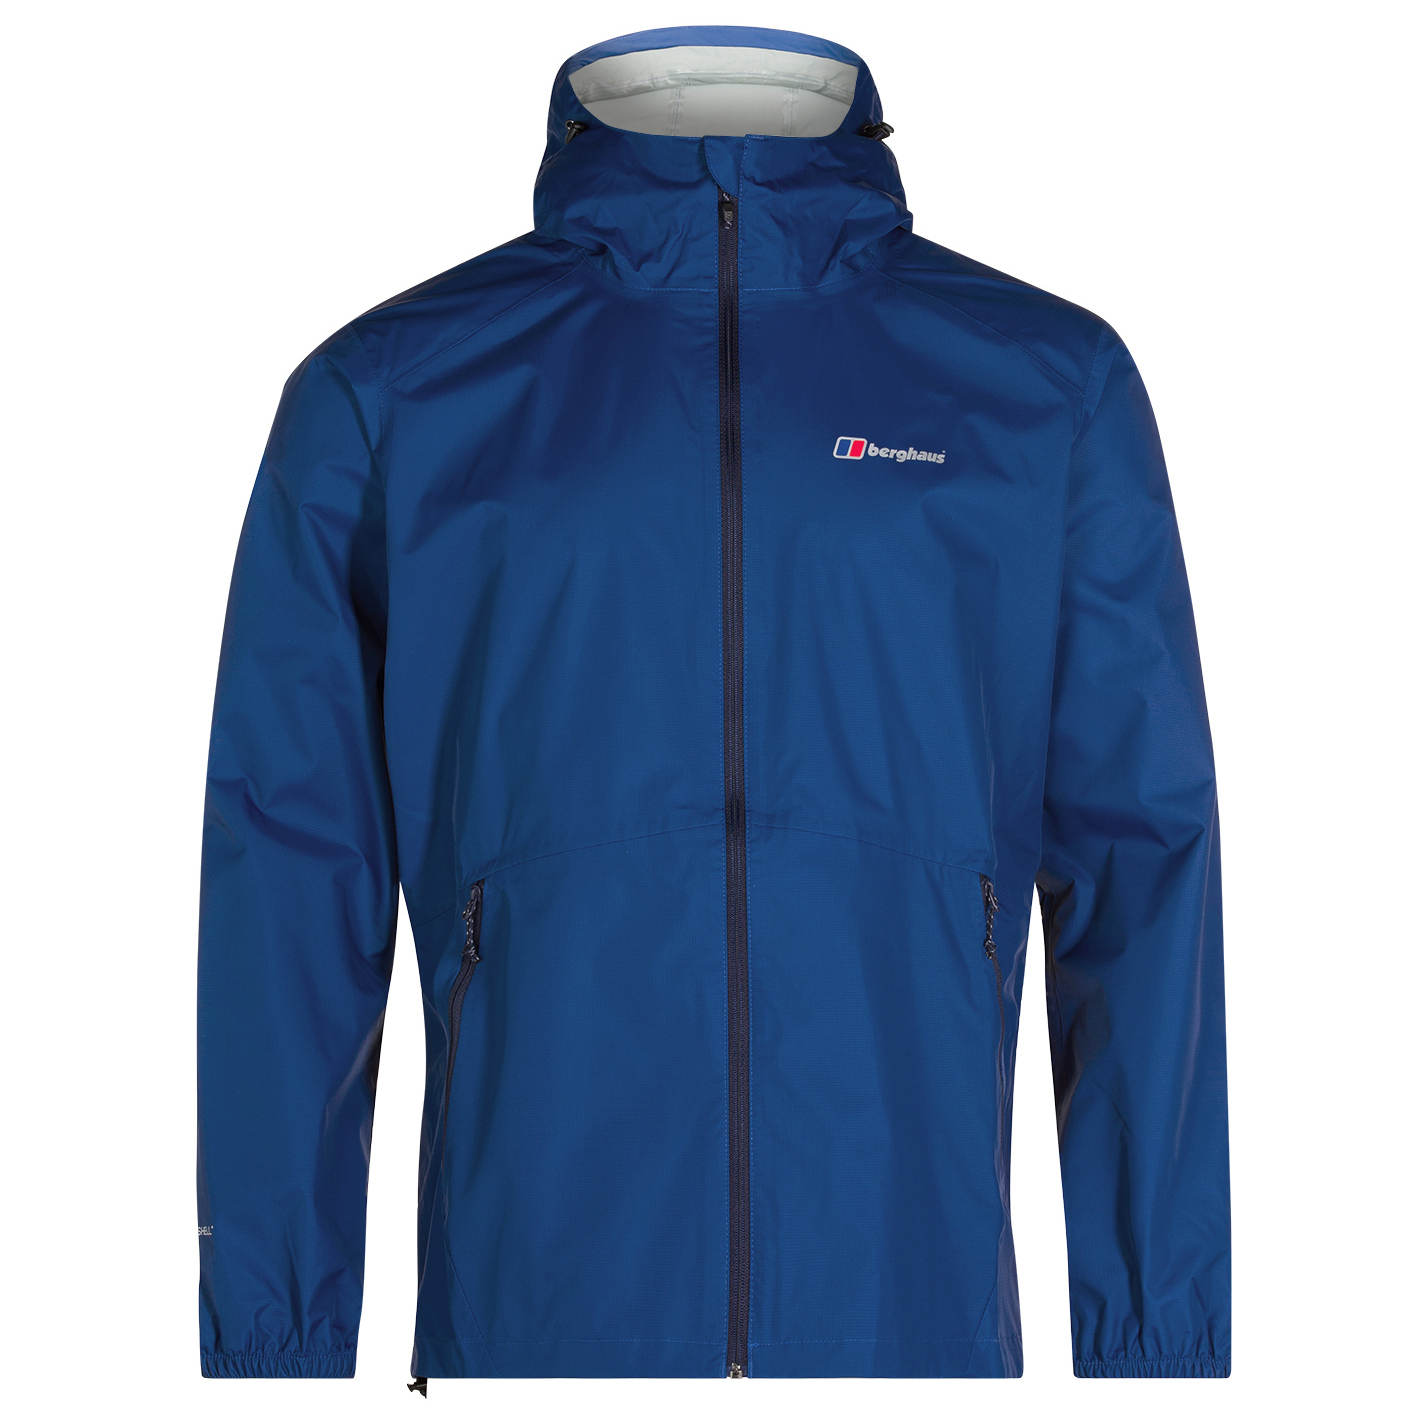 c62257974dda Berghaus Deluge Light Shell Jacket - Waterproof Jacket Men s